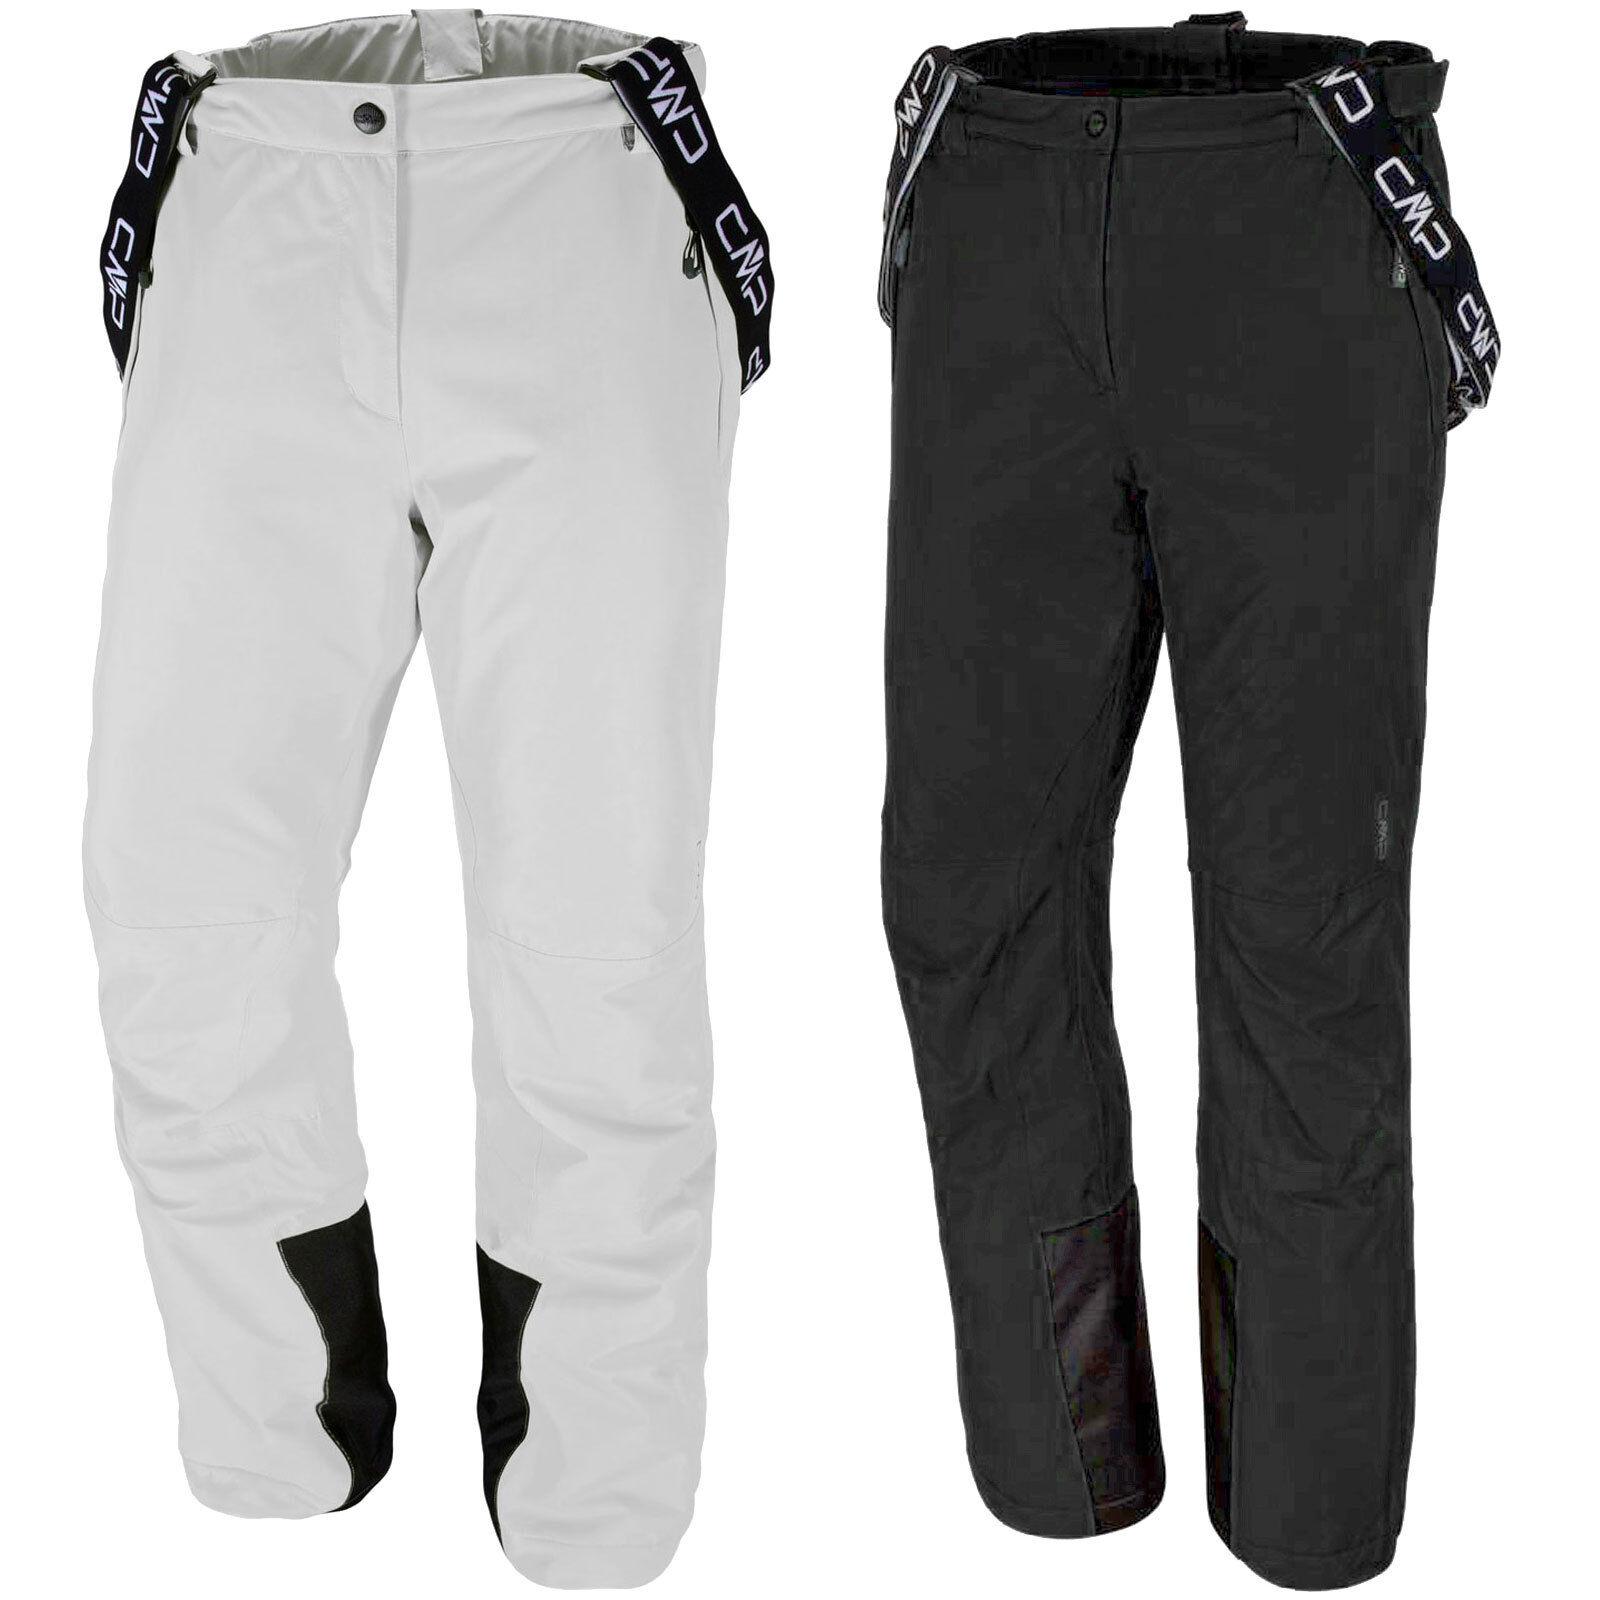 Campagnolo  CMP Trousers Ladies Ski Pants Snowboard Pants Snow Trousers Trousers  sale with high discount